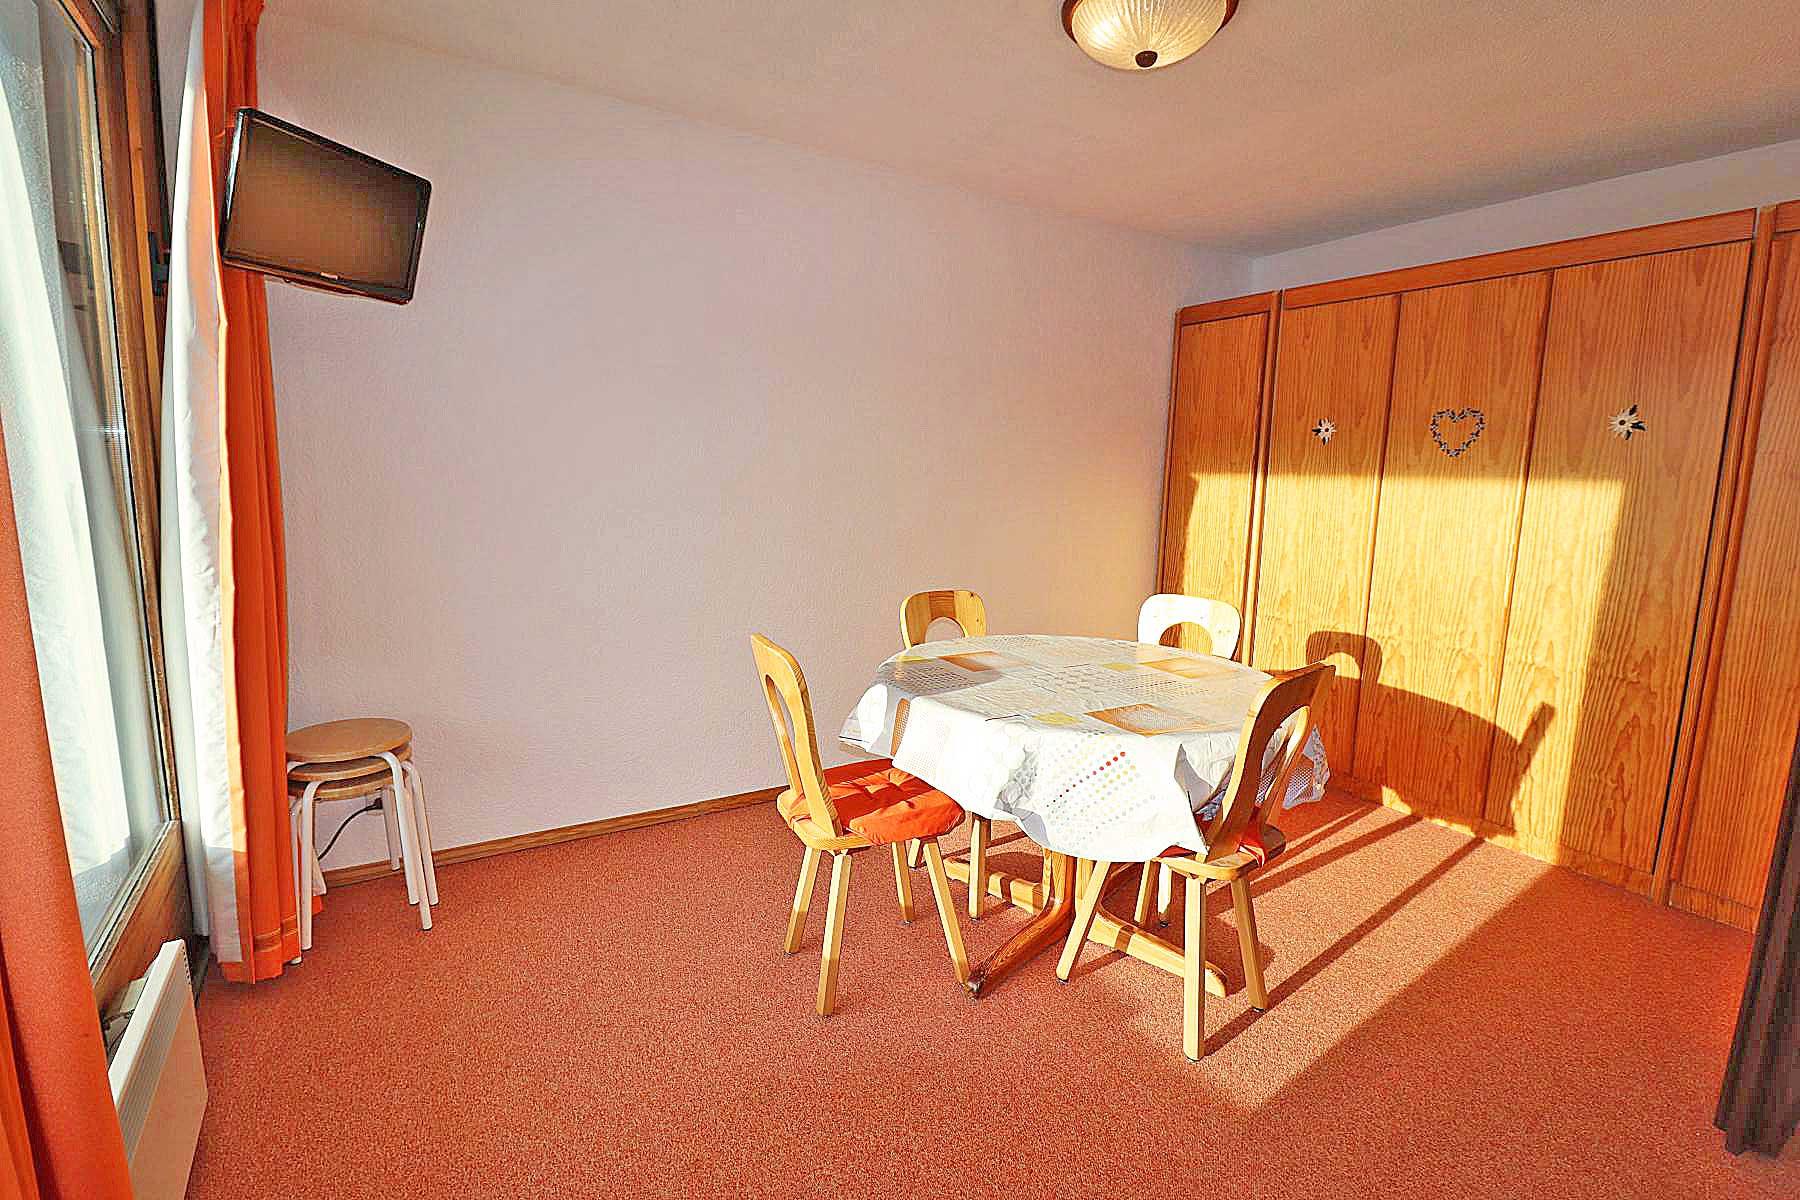 Studio appt 822 Dining Room / Bedroom